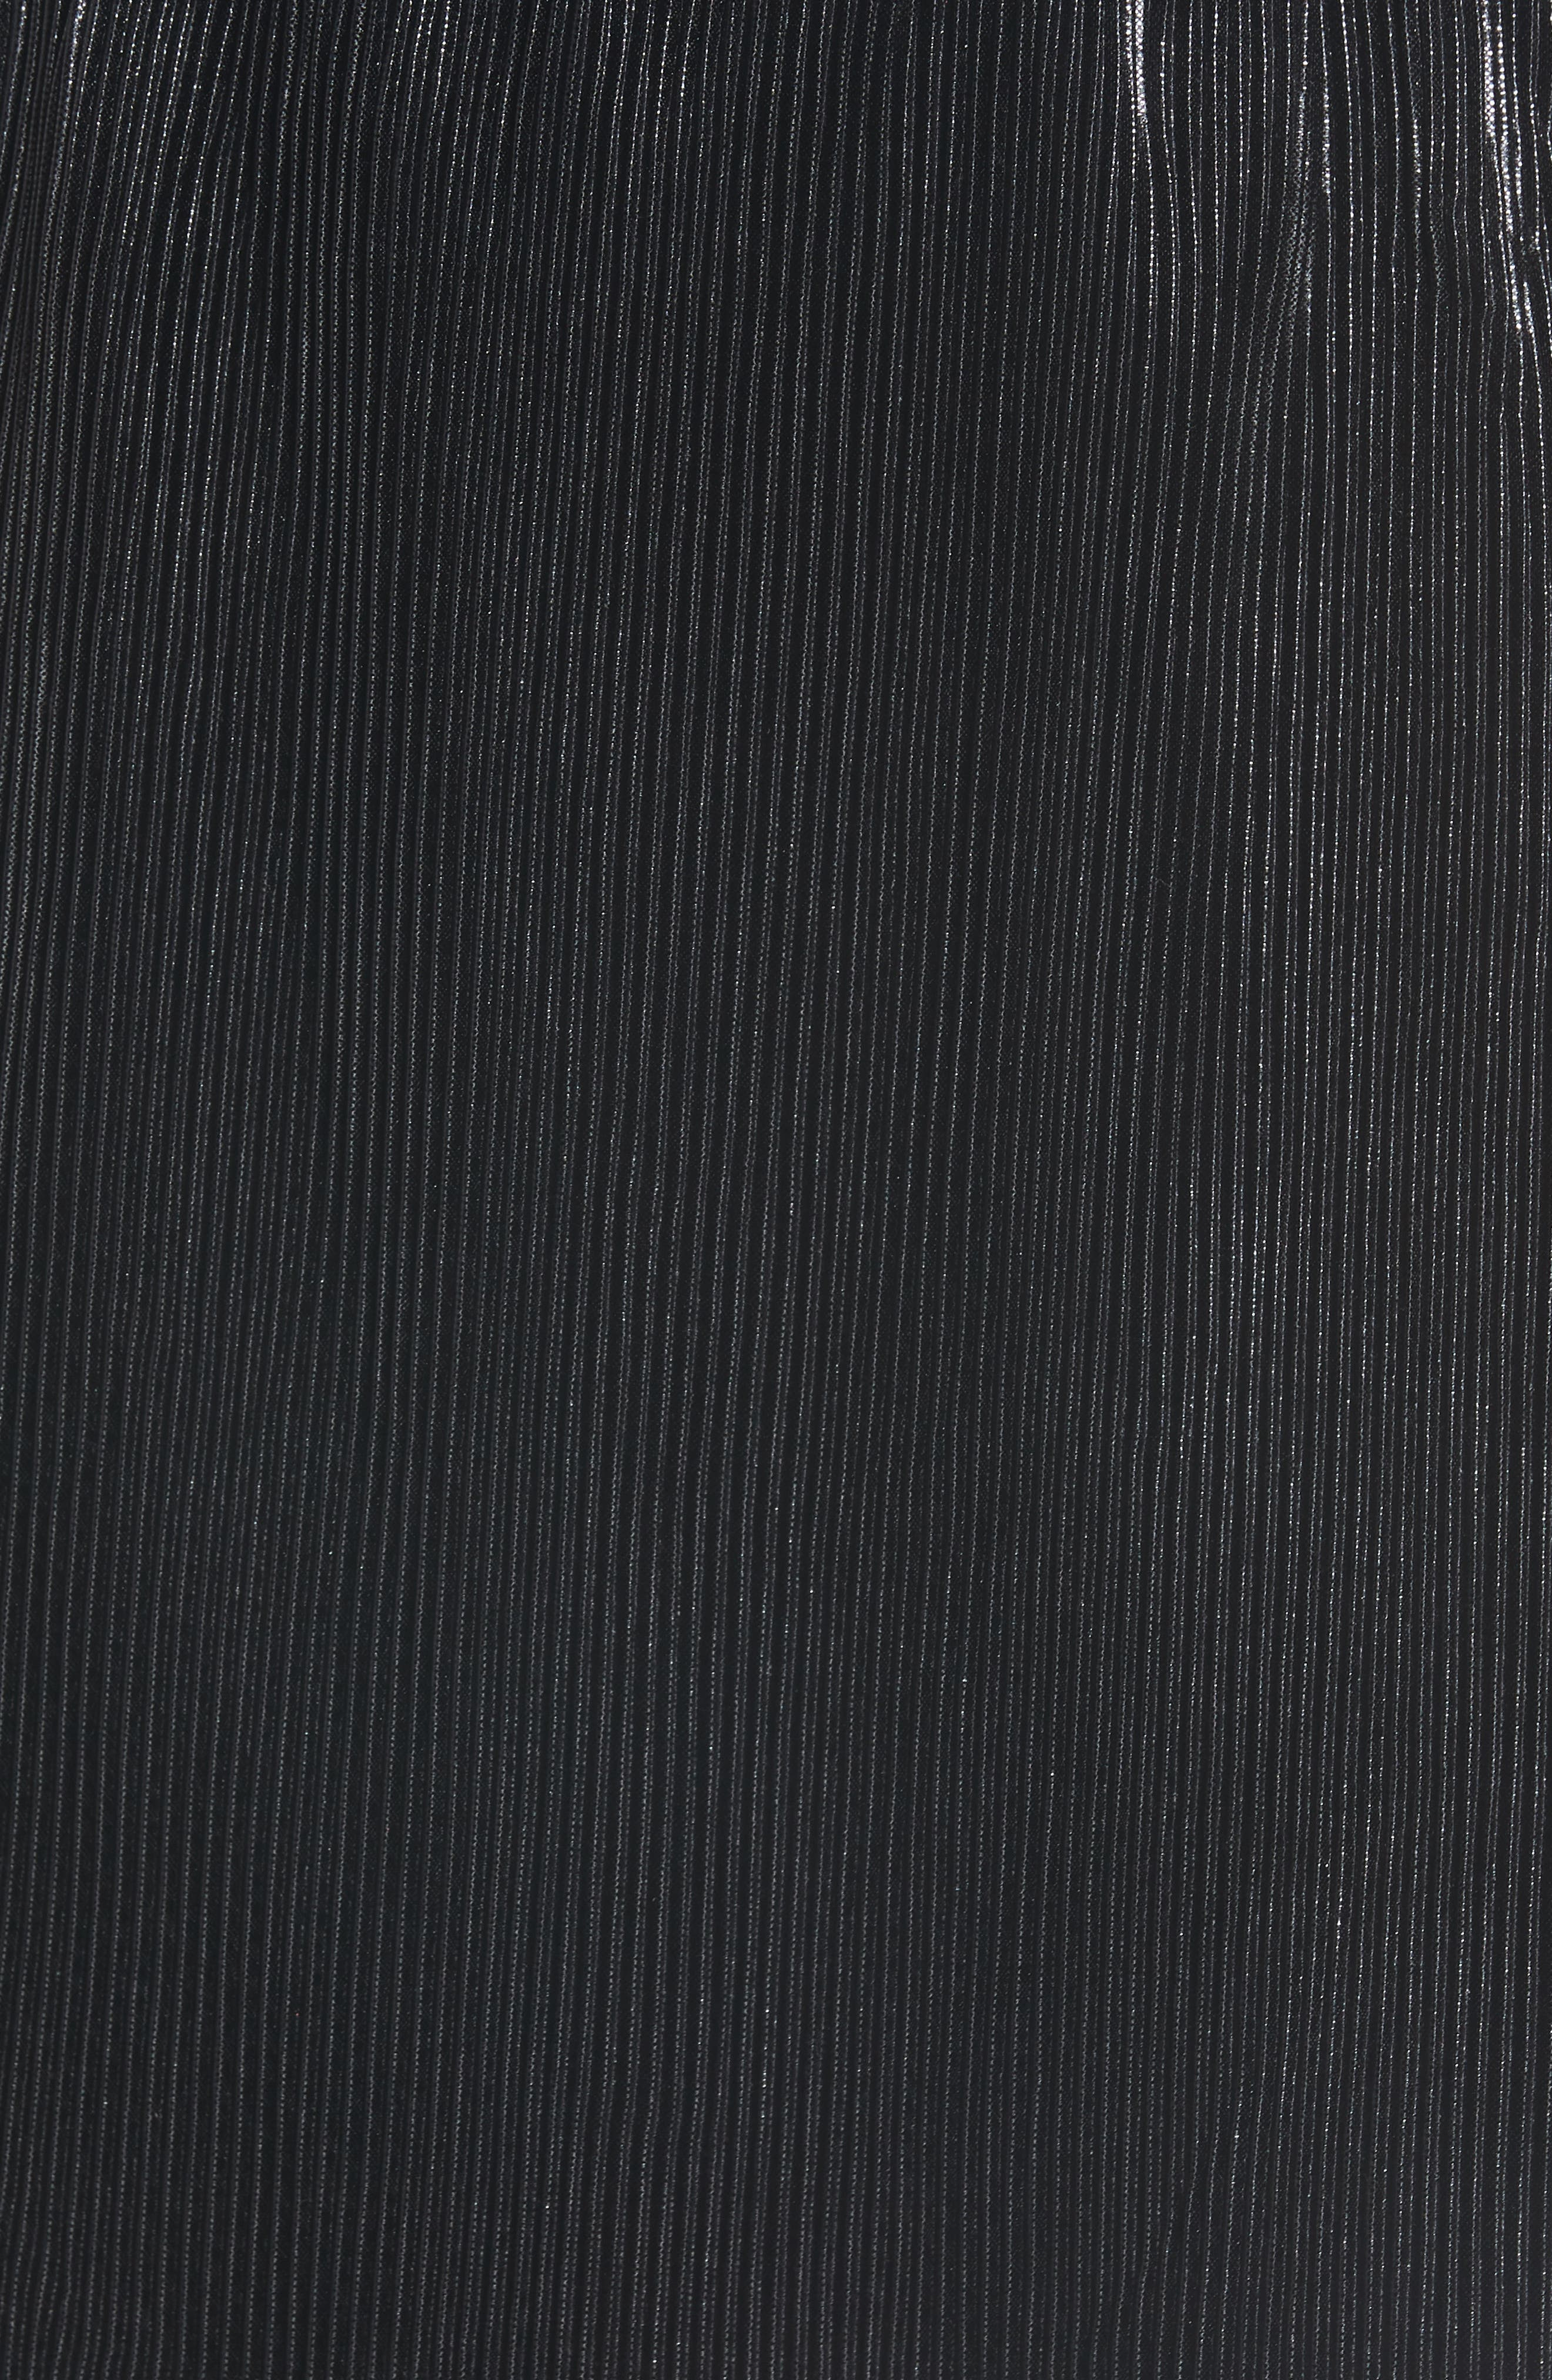 Shine On Shine On Pleated Dress,                             Alternate thumbnail 6, color,                             BLACK